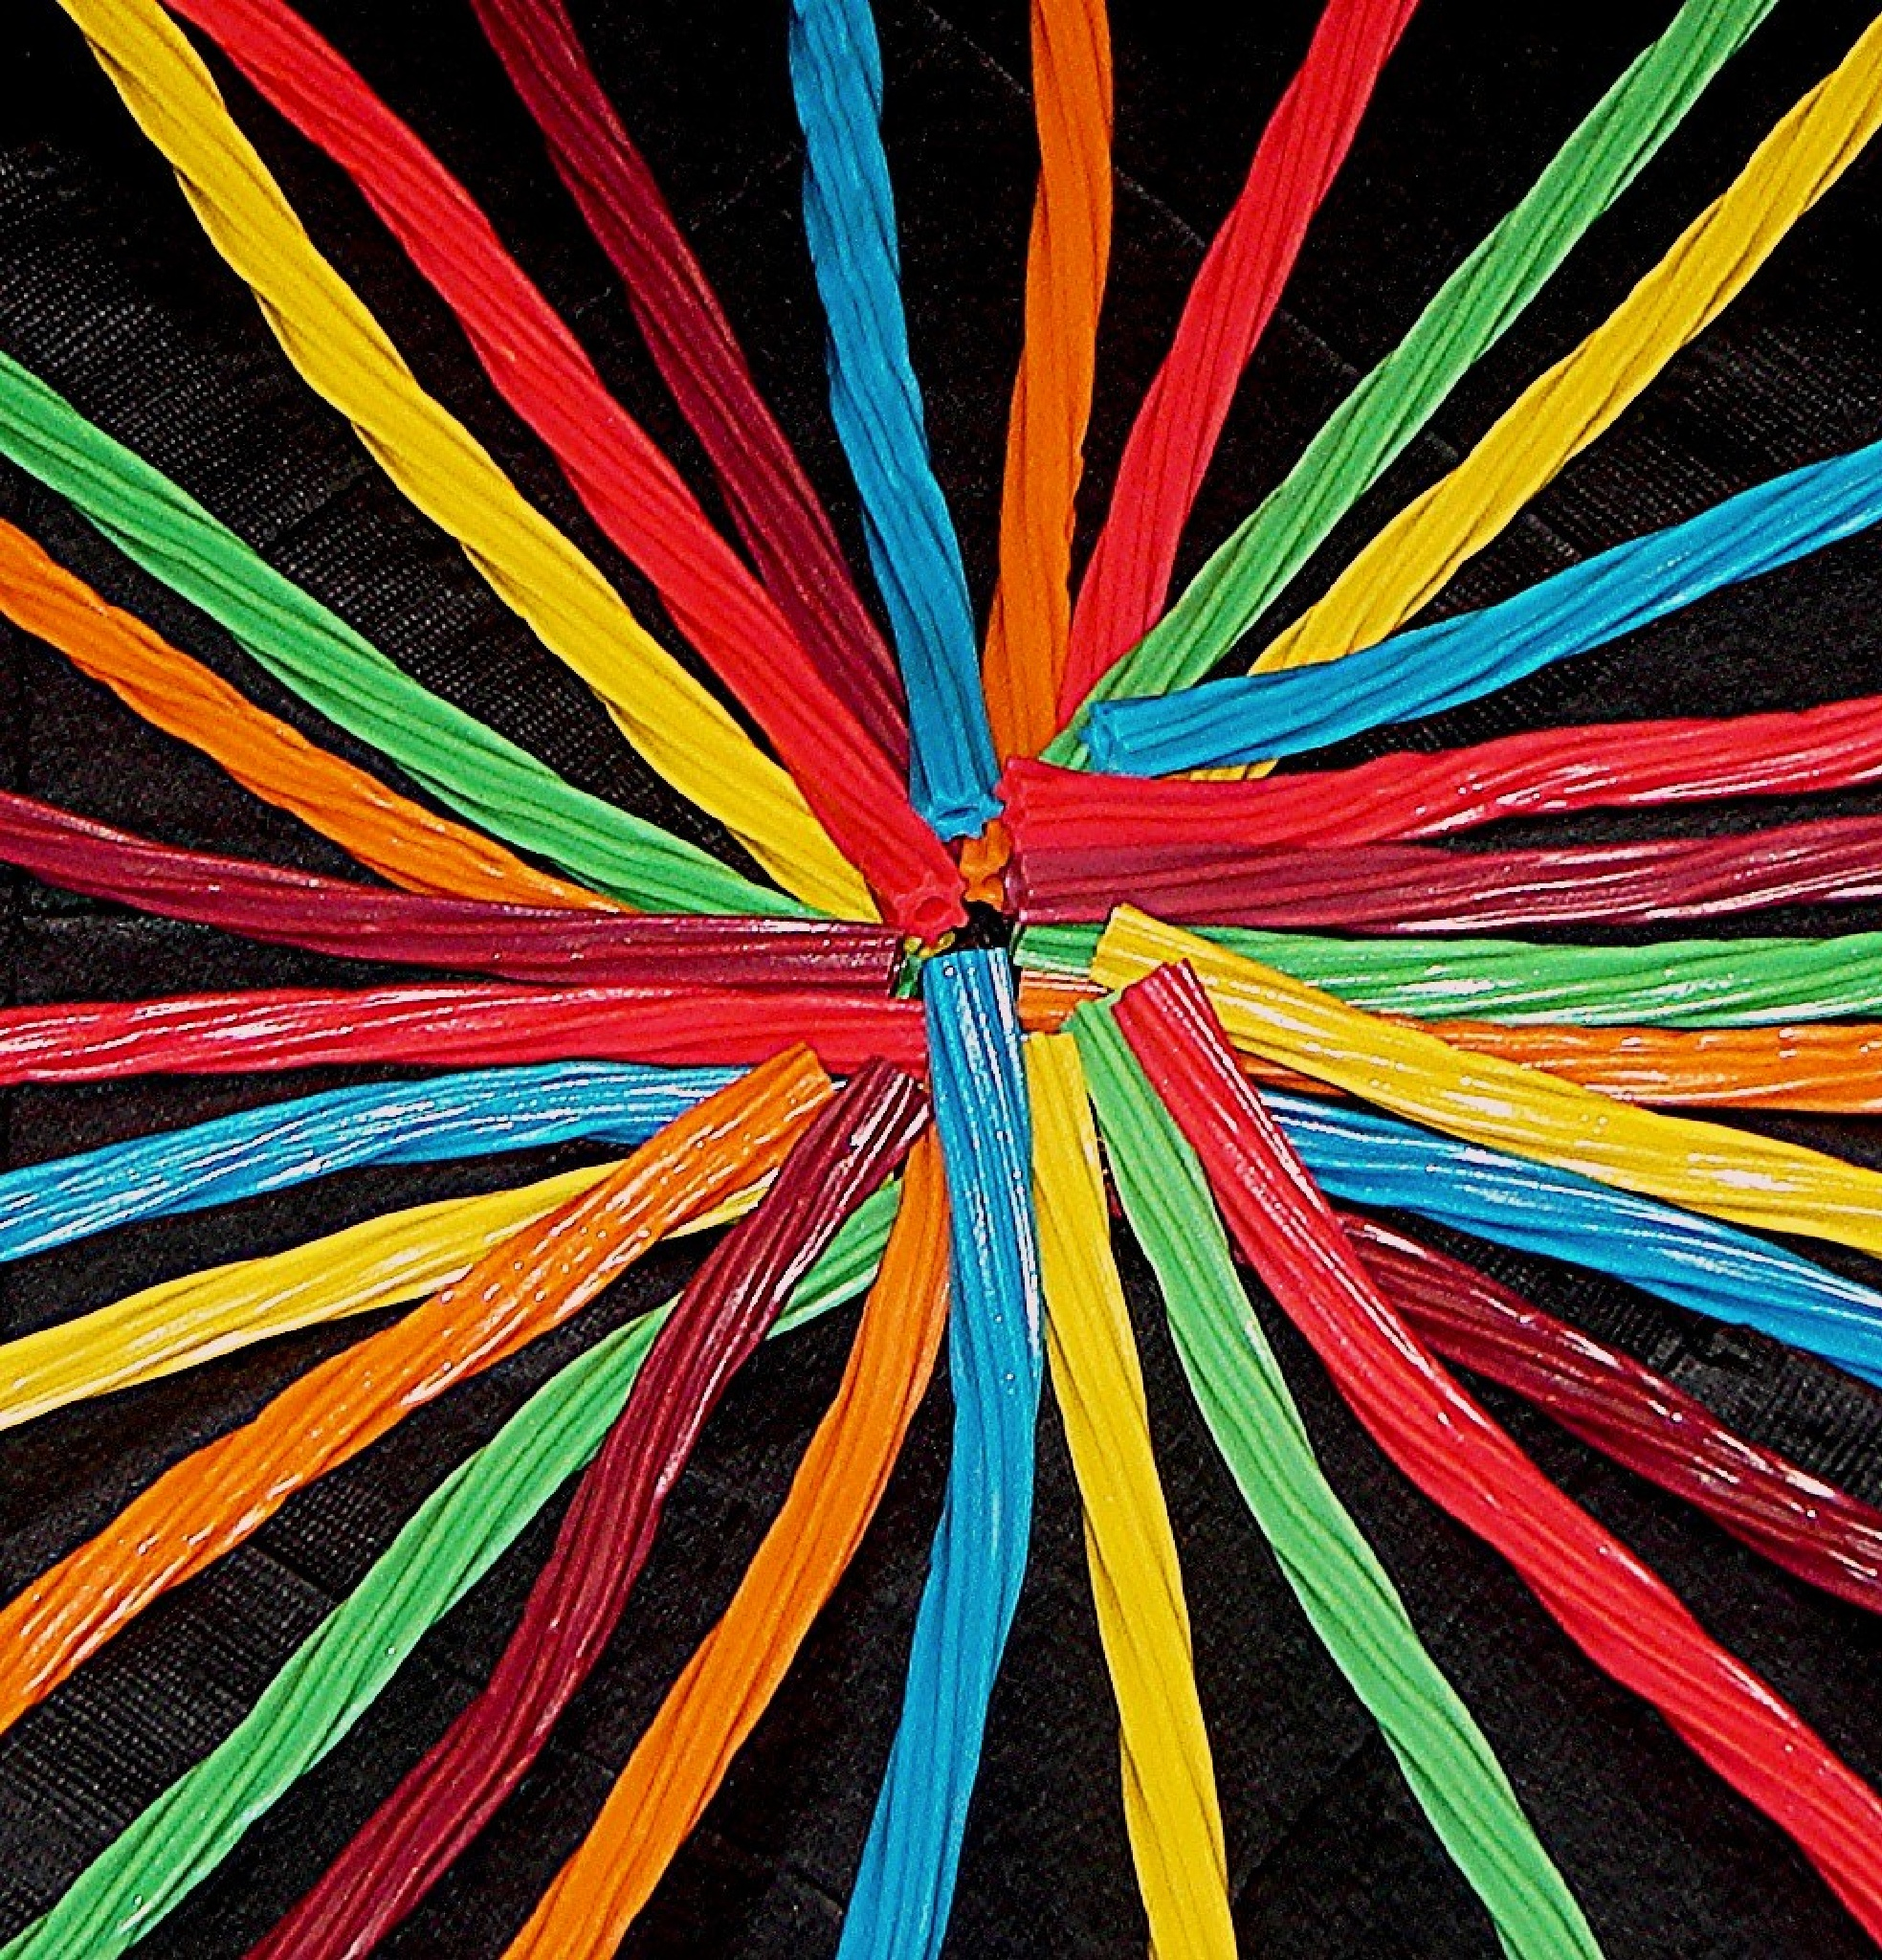 Multi- color licorice by idalif